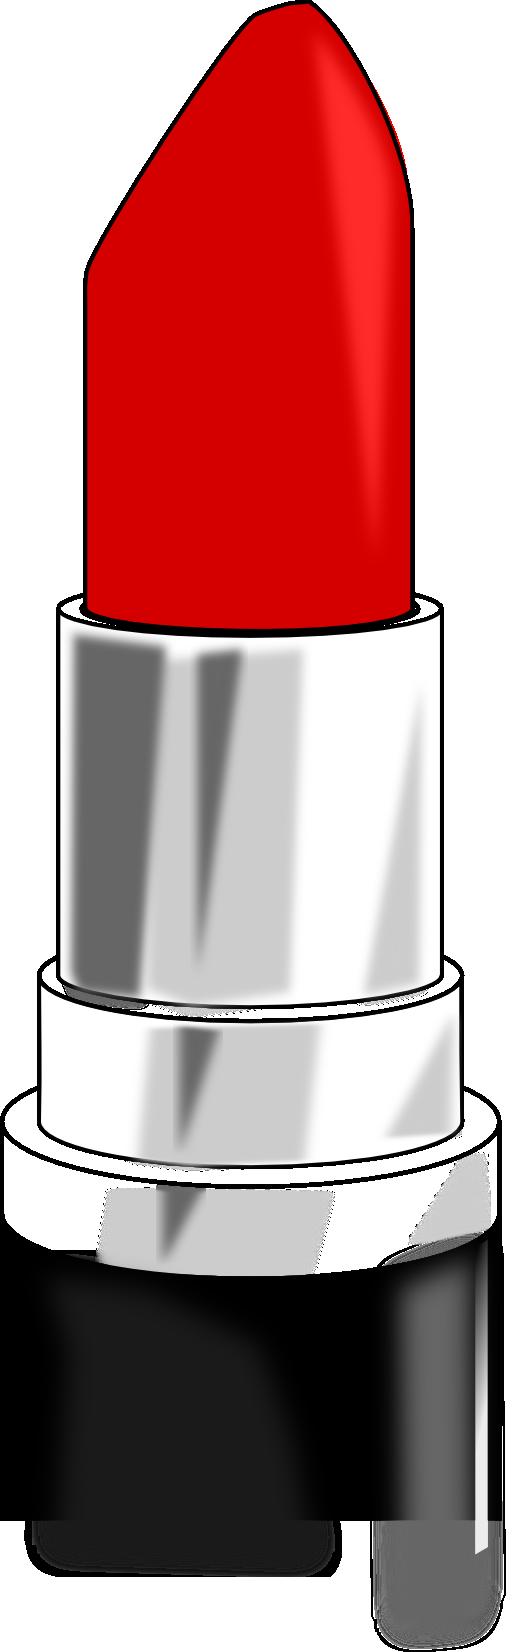 lipstick clipart i2clipart royalty free public domain lipstick clipart black lipstick clip art svg